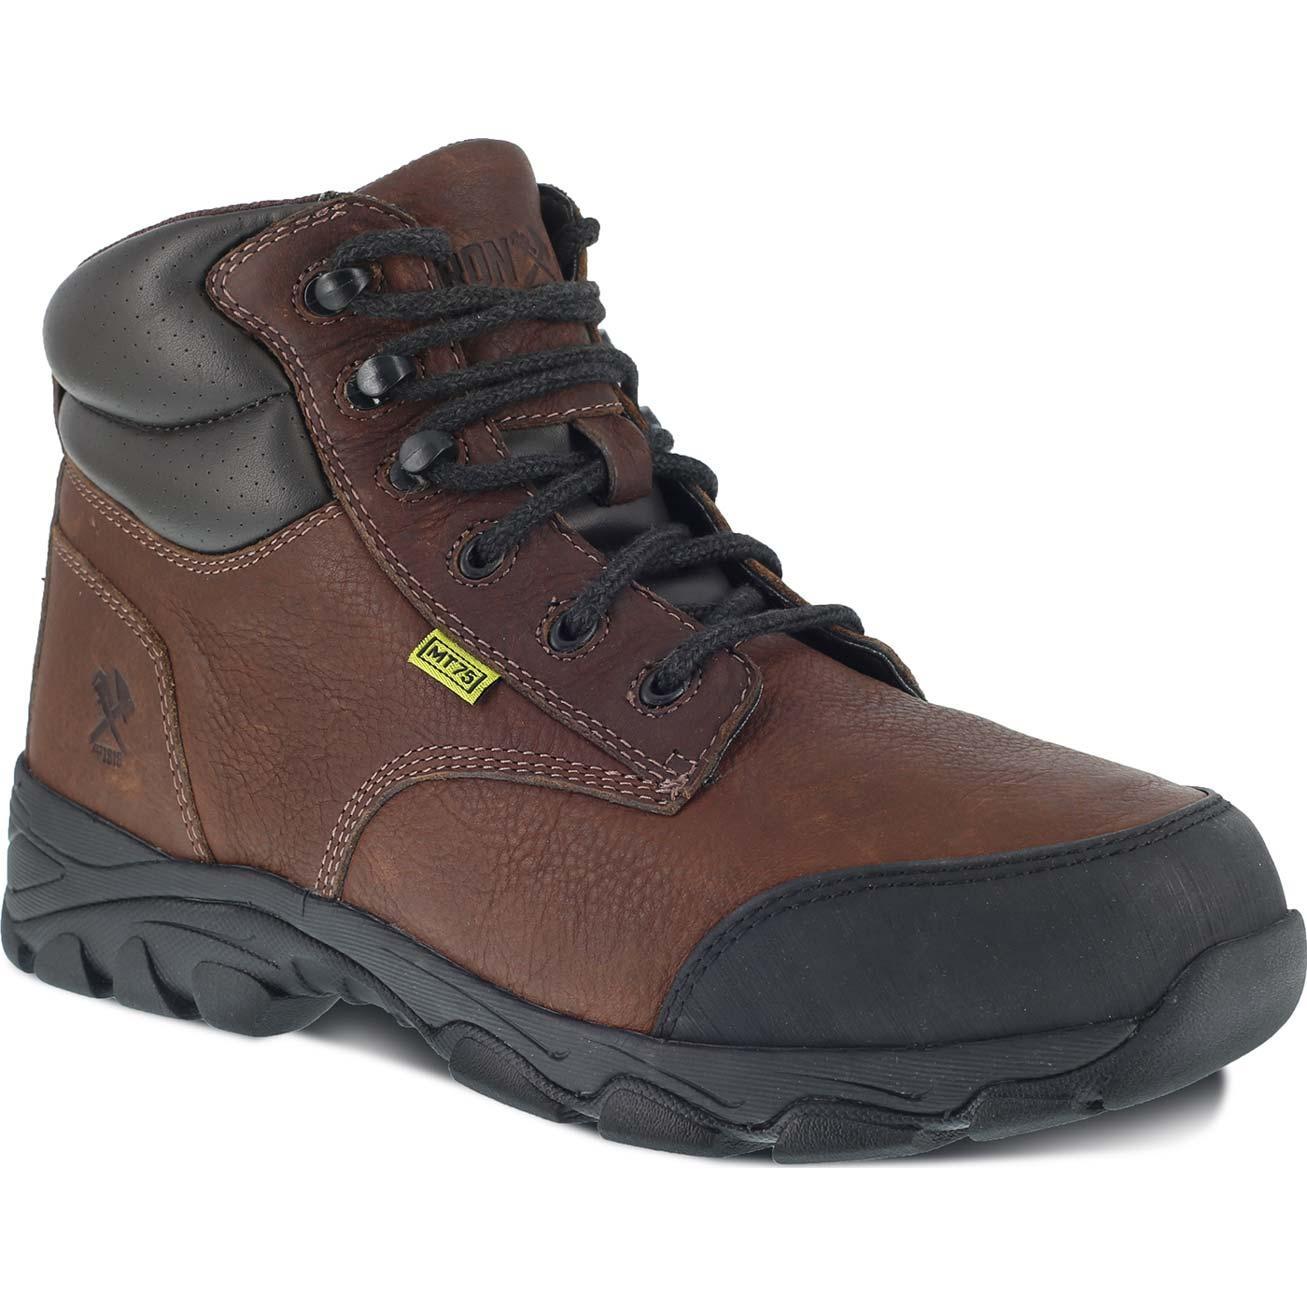 62e00a39dab Iron Age Galvanizer Steel Toe Internal Met Guard Work Boot